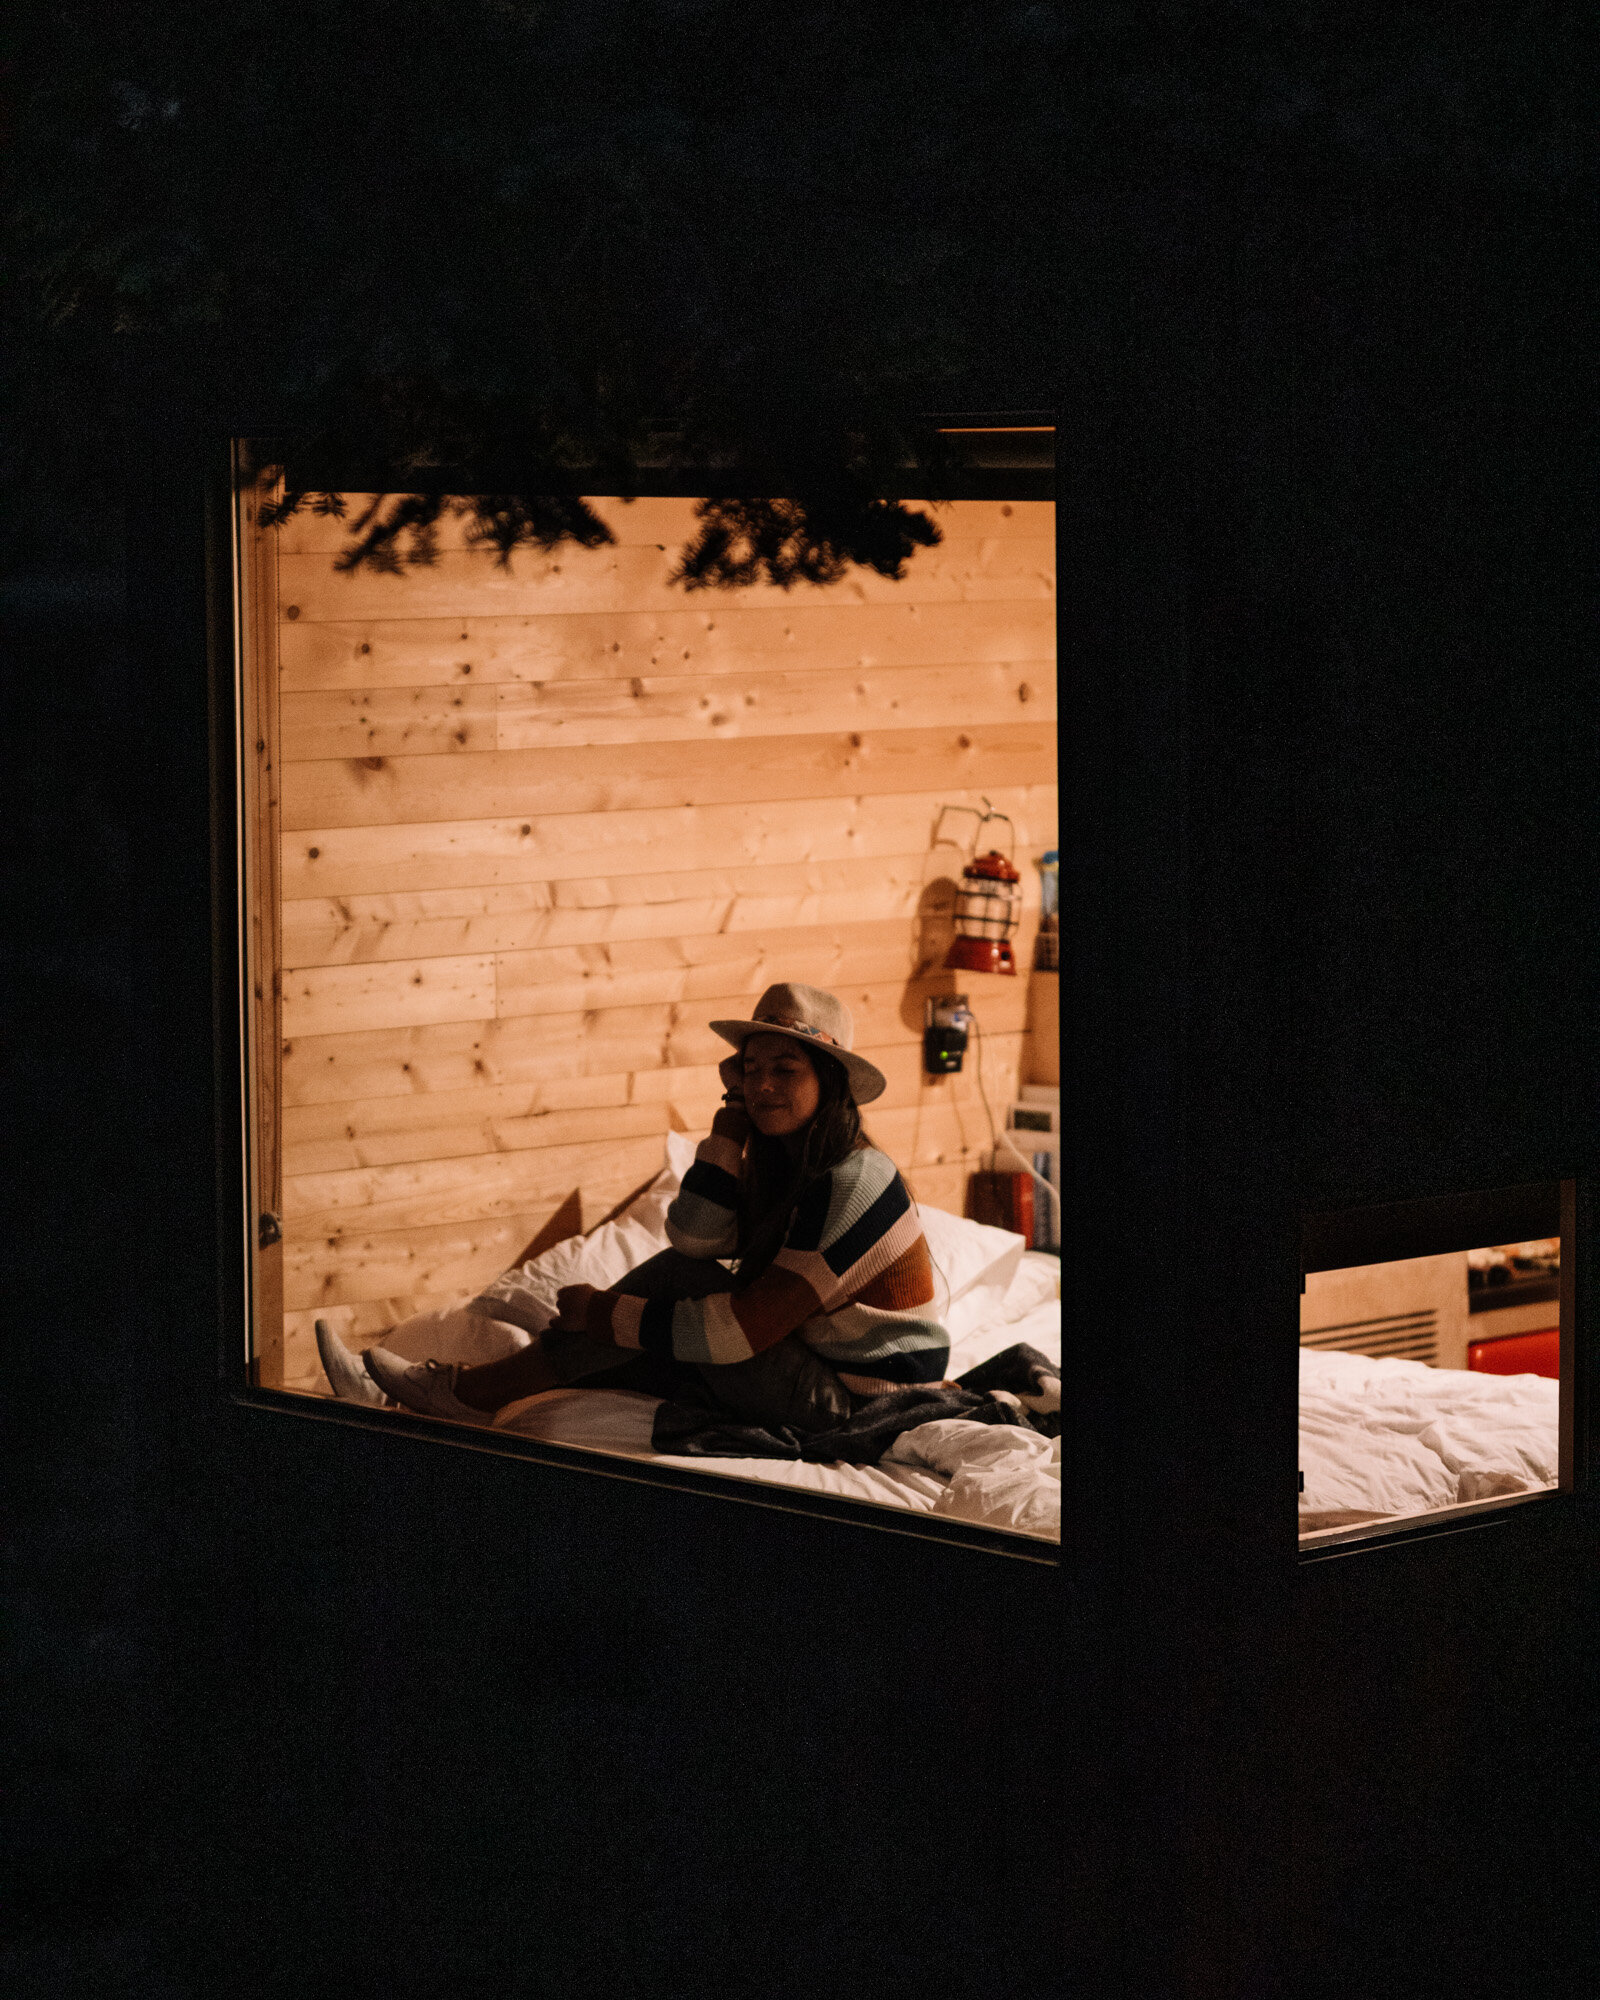 Rachel Off Duty: Girl in Window at The Getaway House, Big Bear